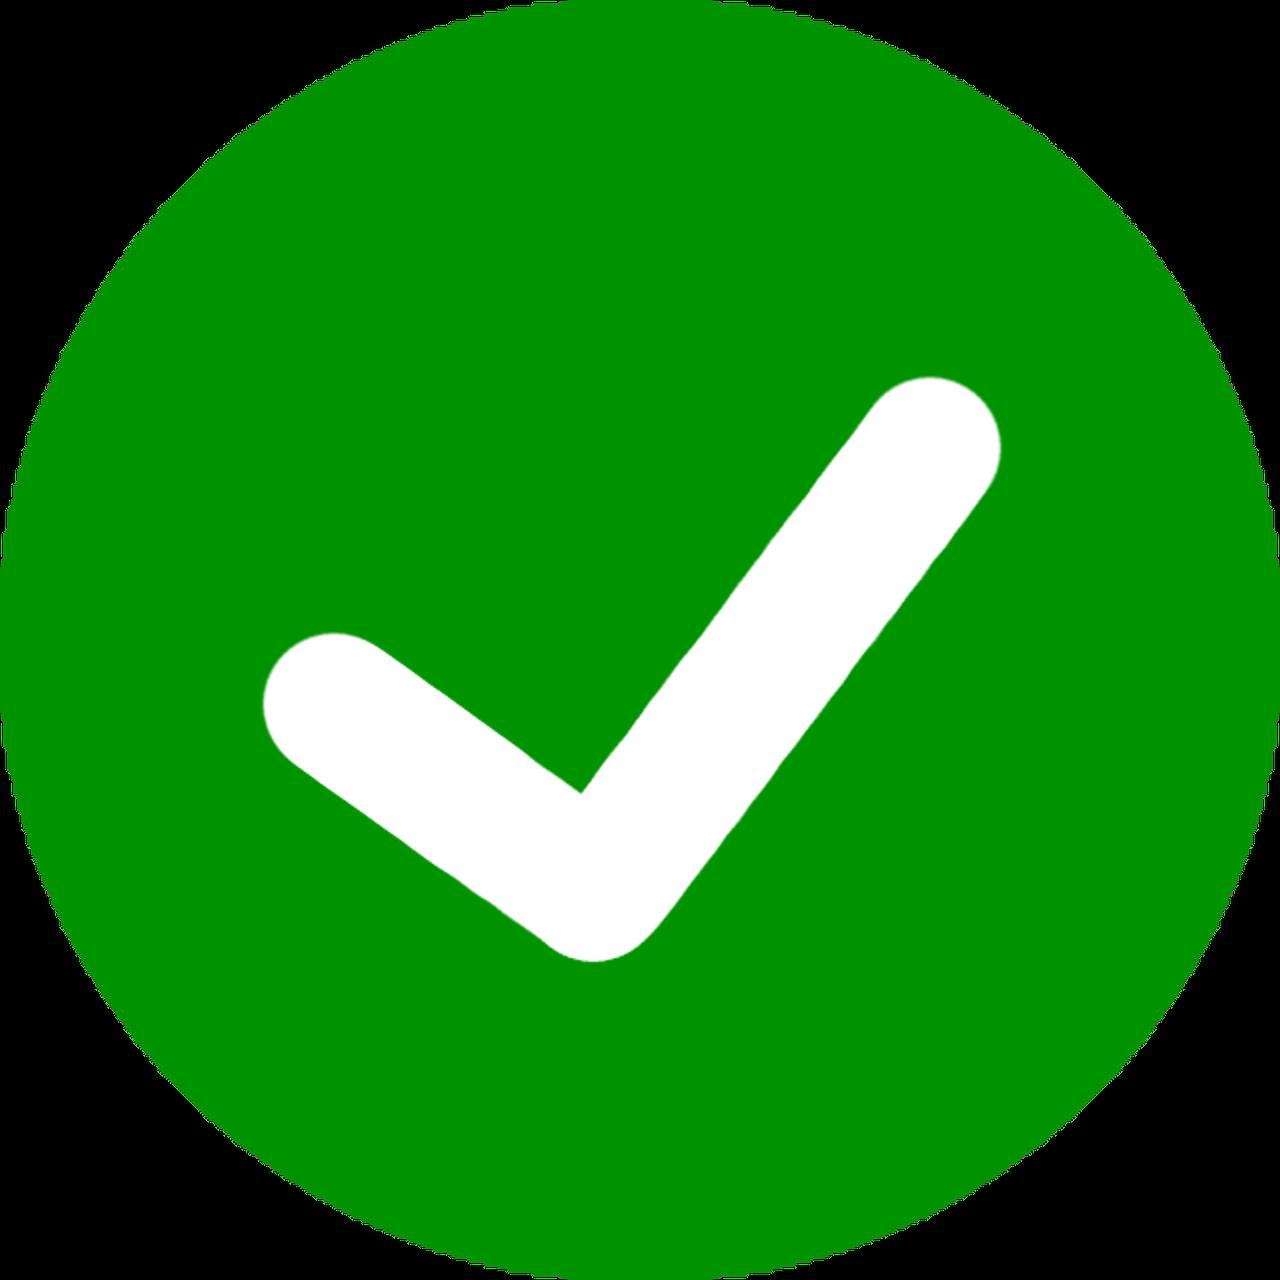 green box